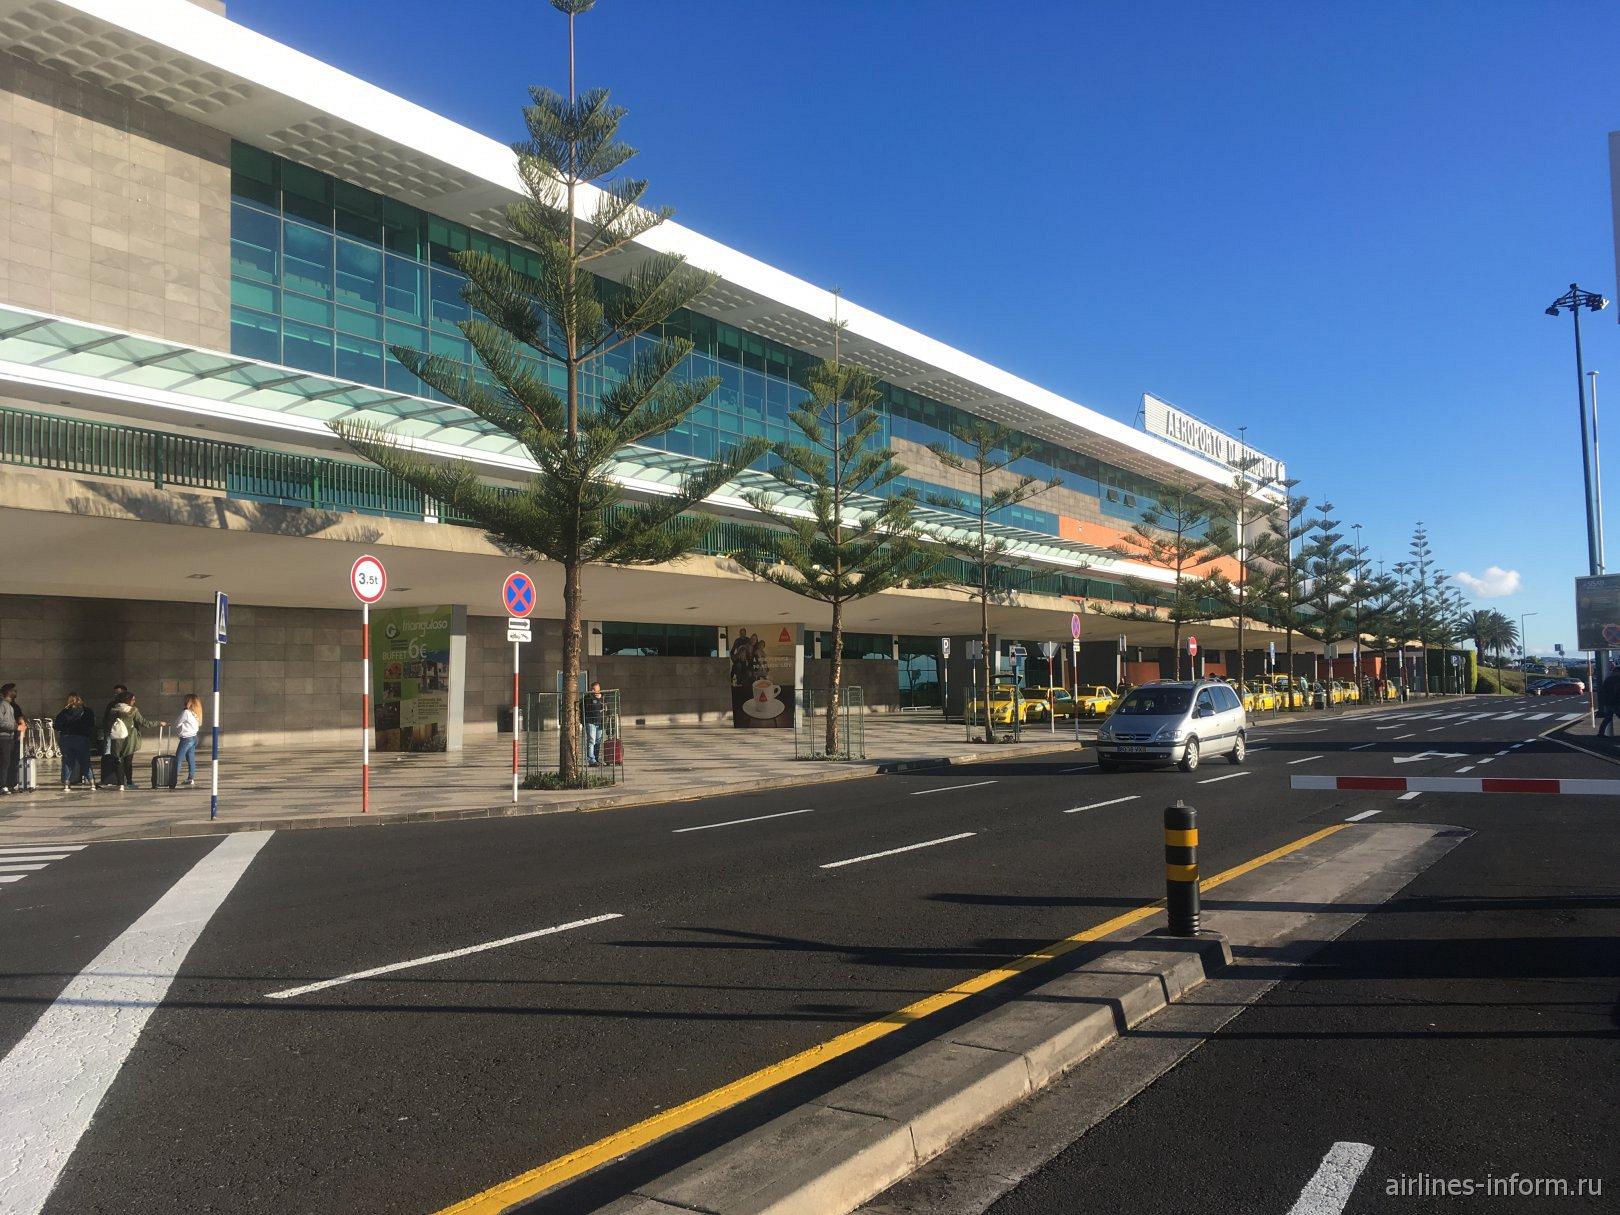 Пассажирский терминал аэропорта Мадейра